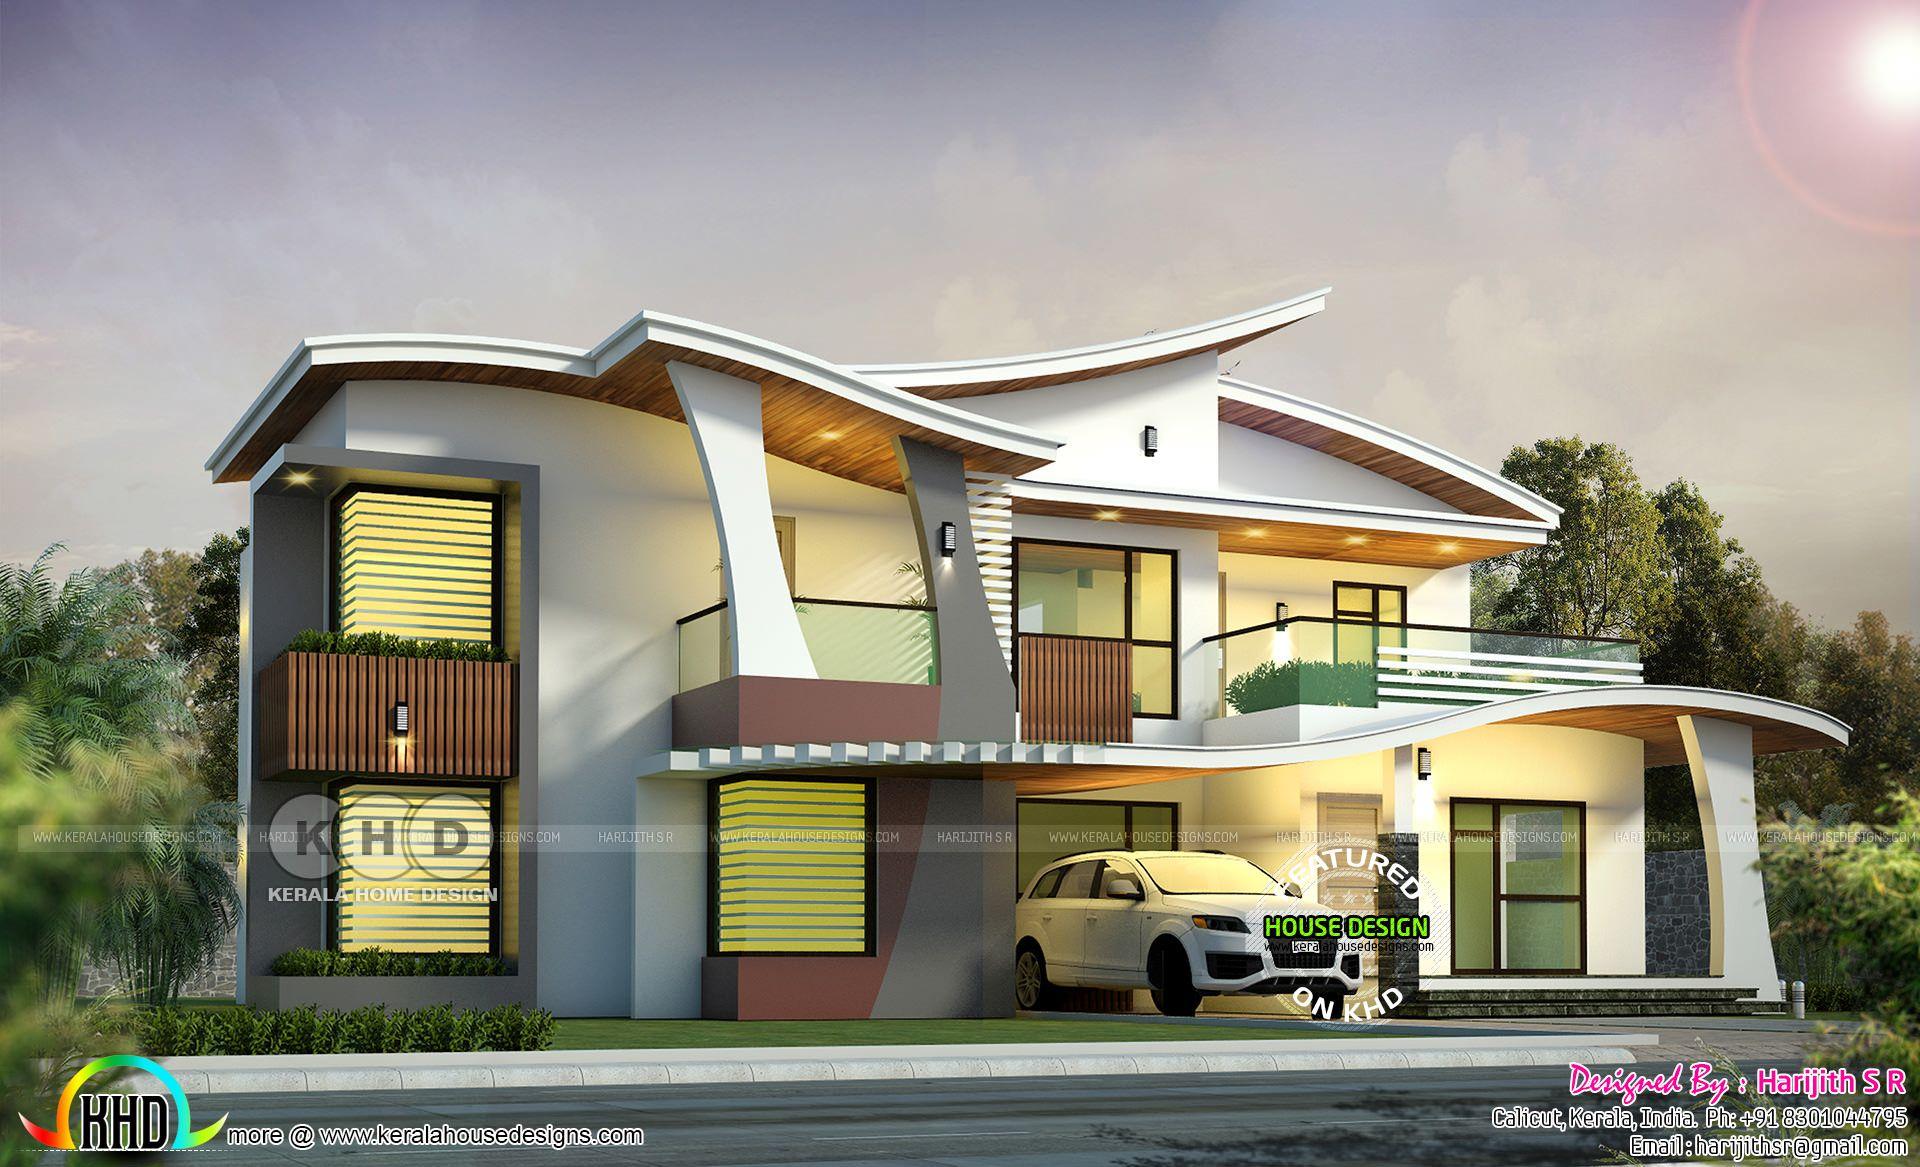 2943 Sq Ft Ultra Modern Kerala Home Design Modern Residential Architecture Kerala House Design Modern Architecture House